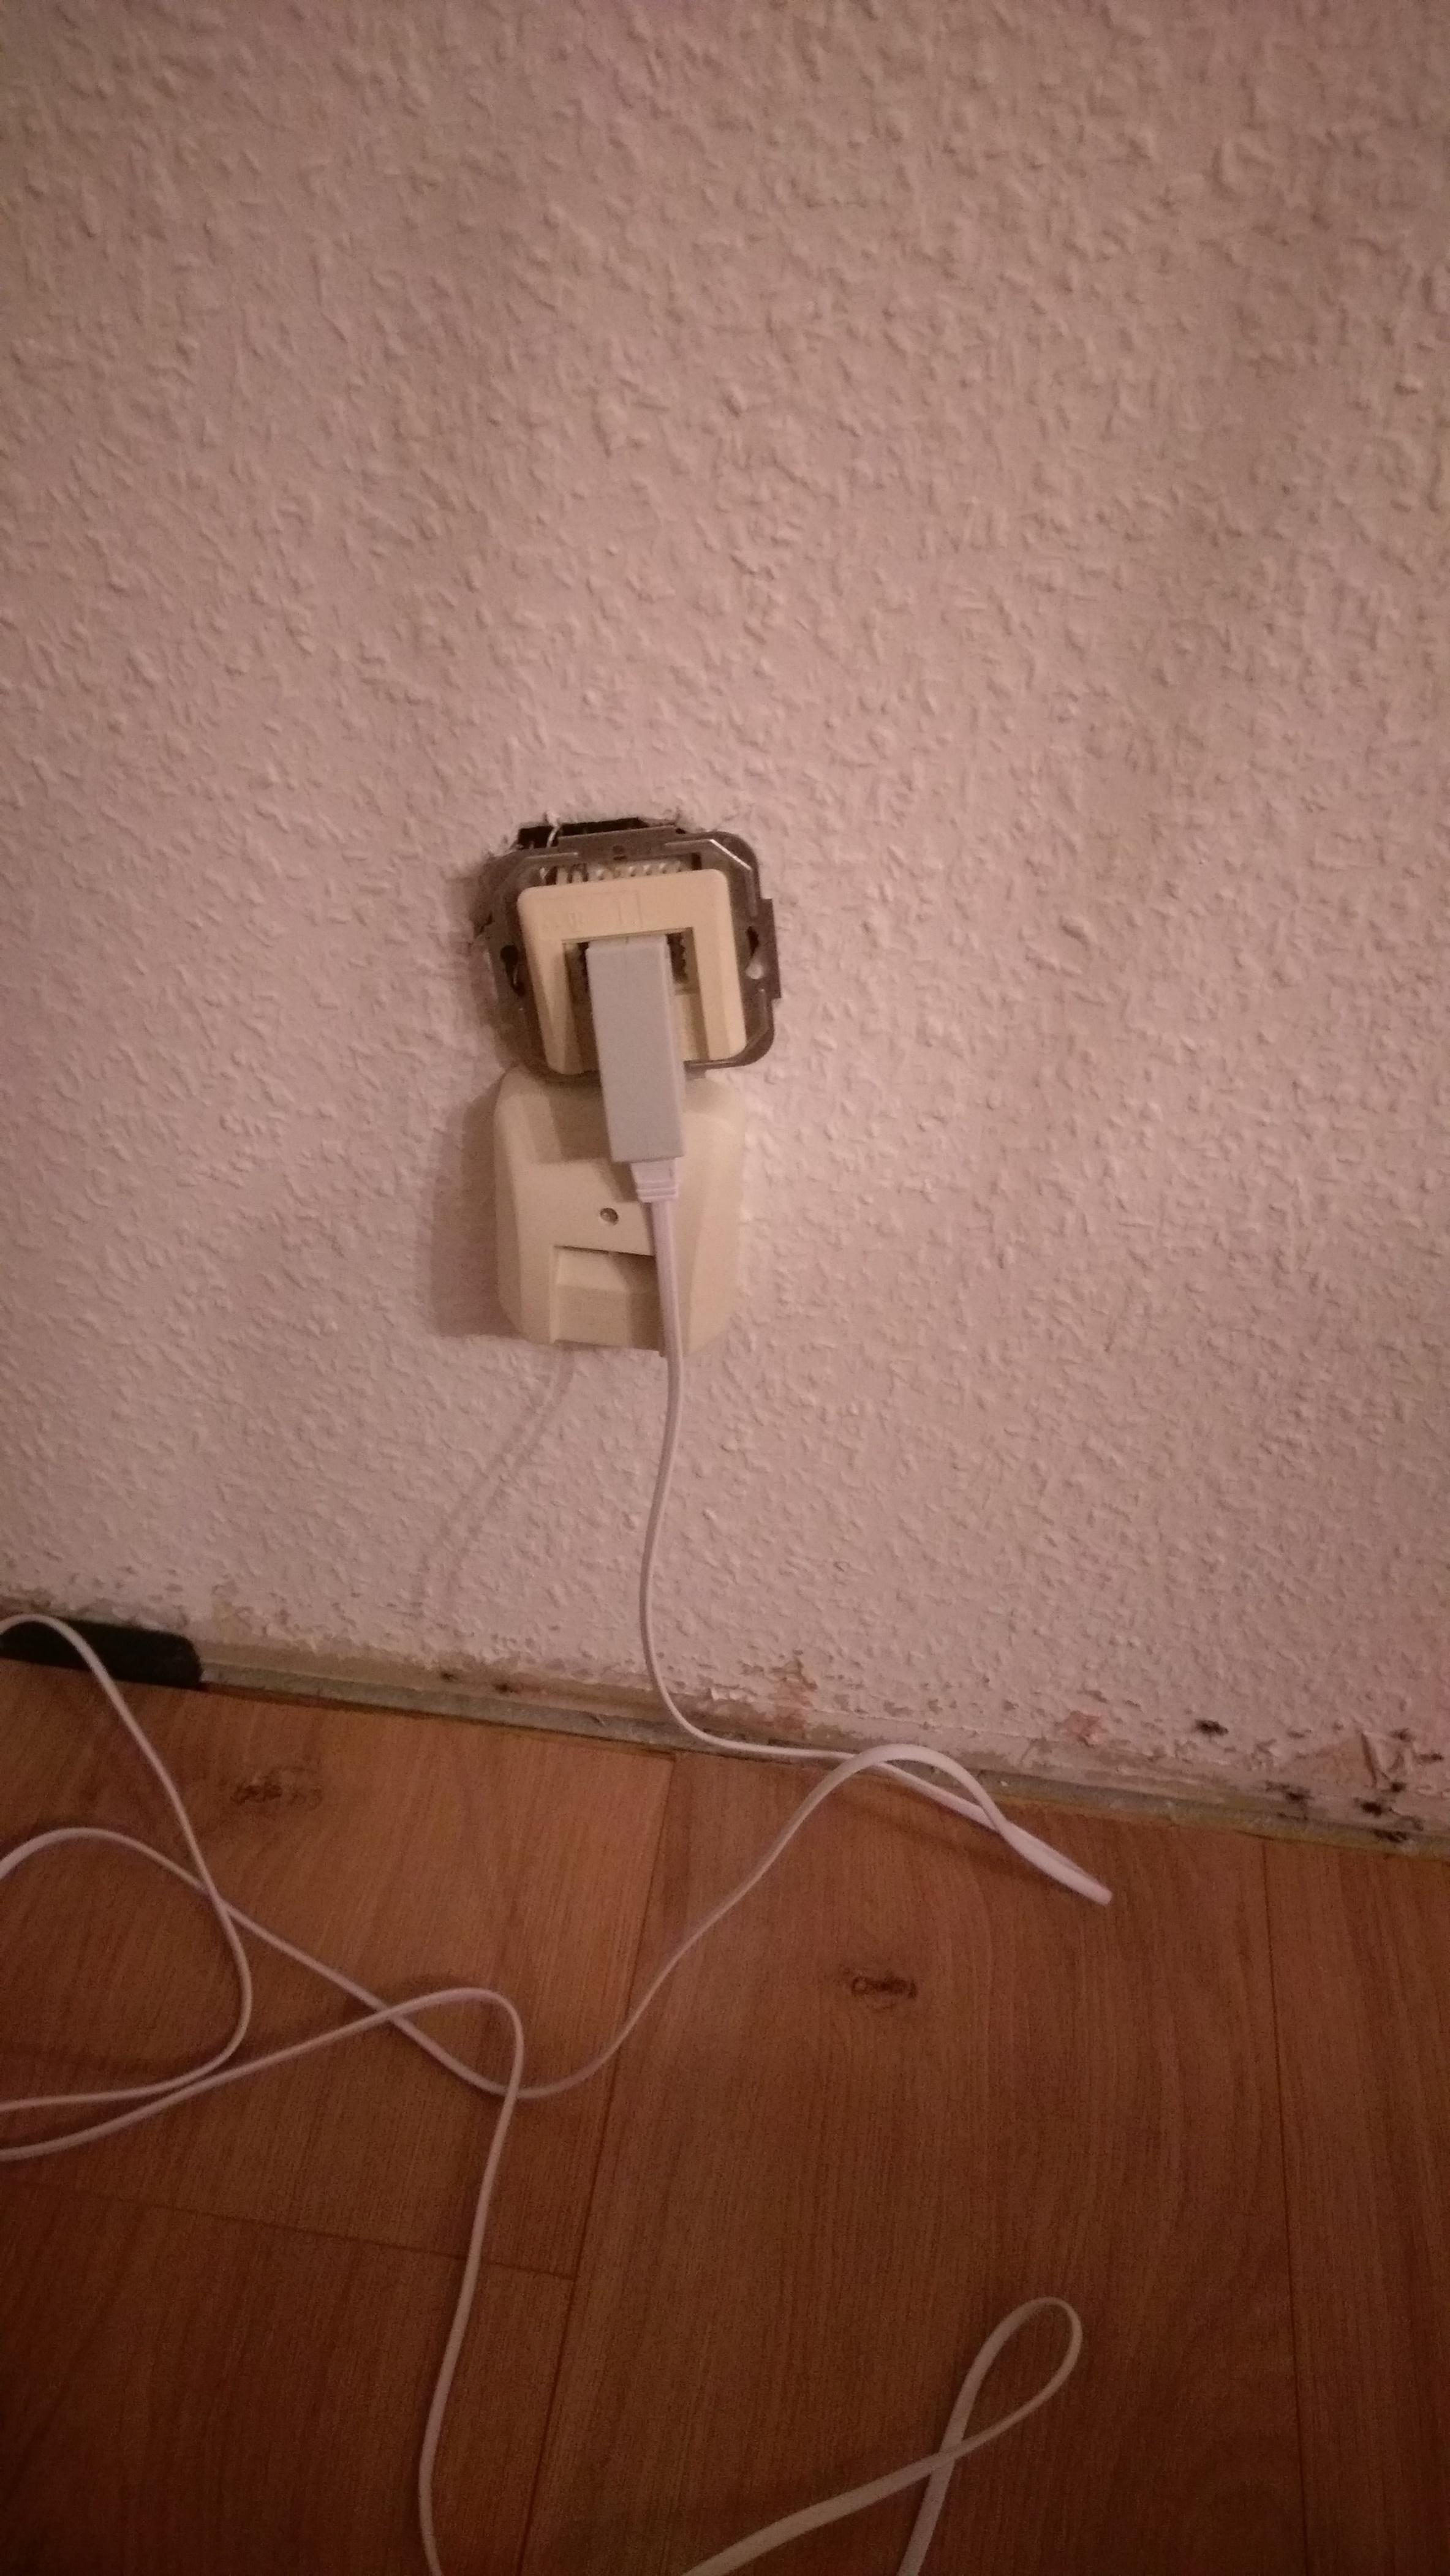 Hilfe bei VoIP Einrichtung, Verkabelung?